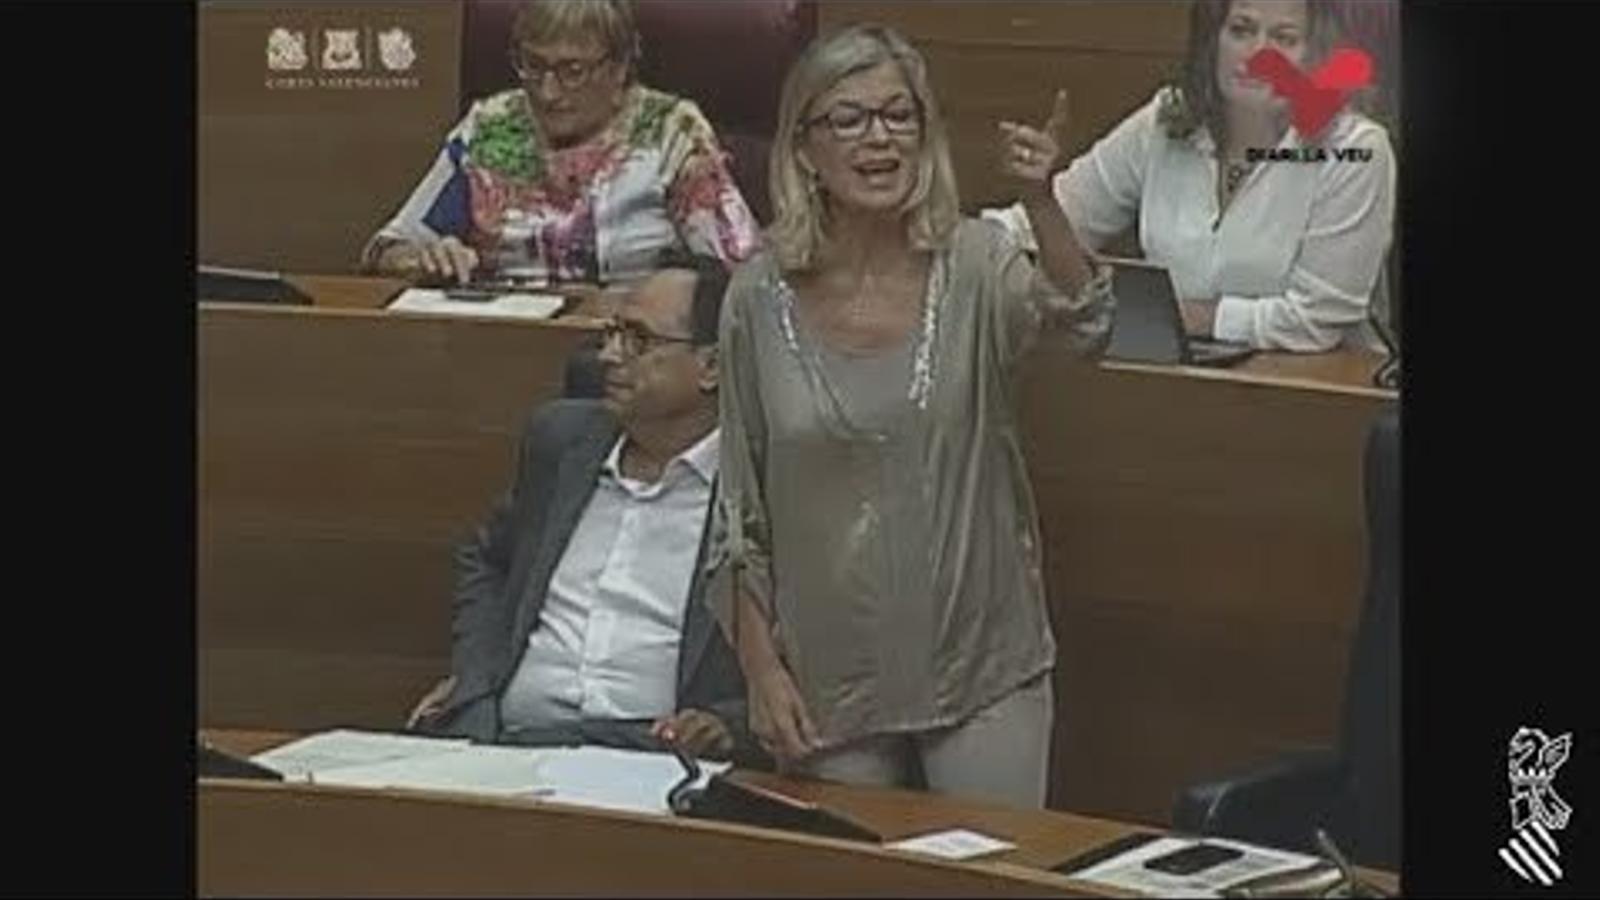 Intervencions en el debat de les Corts Valencianes